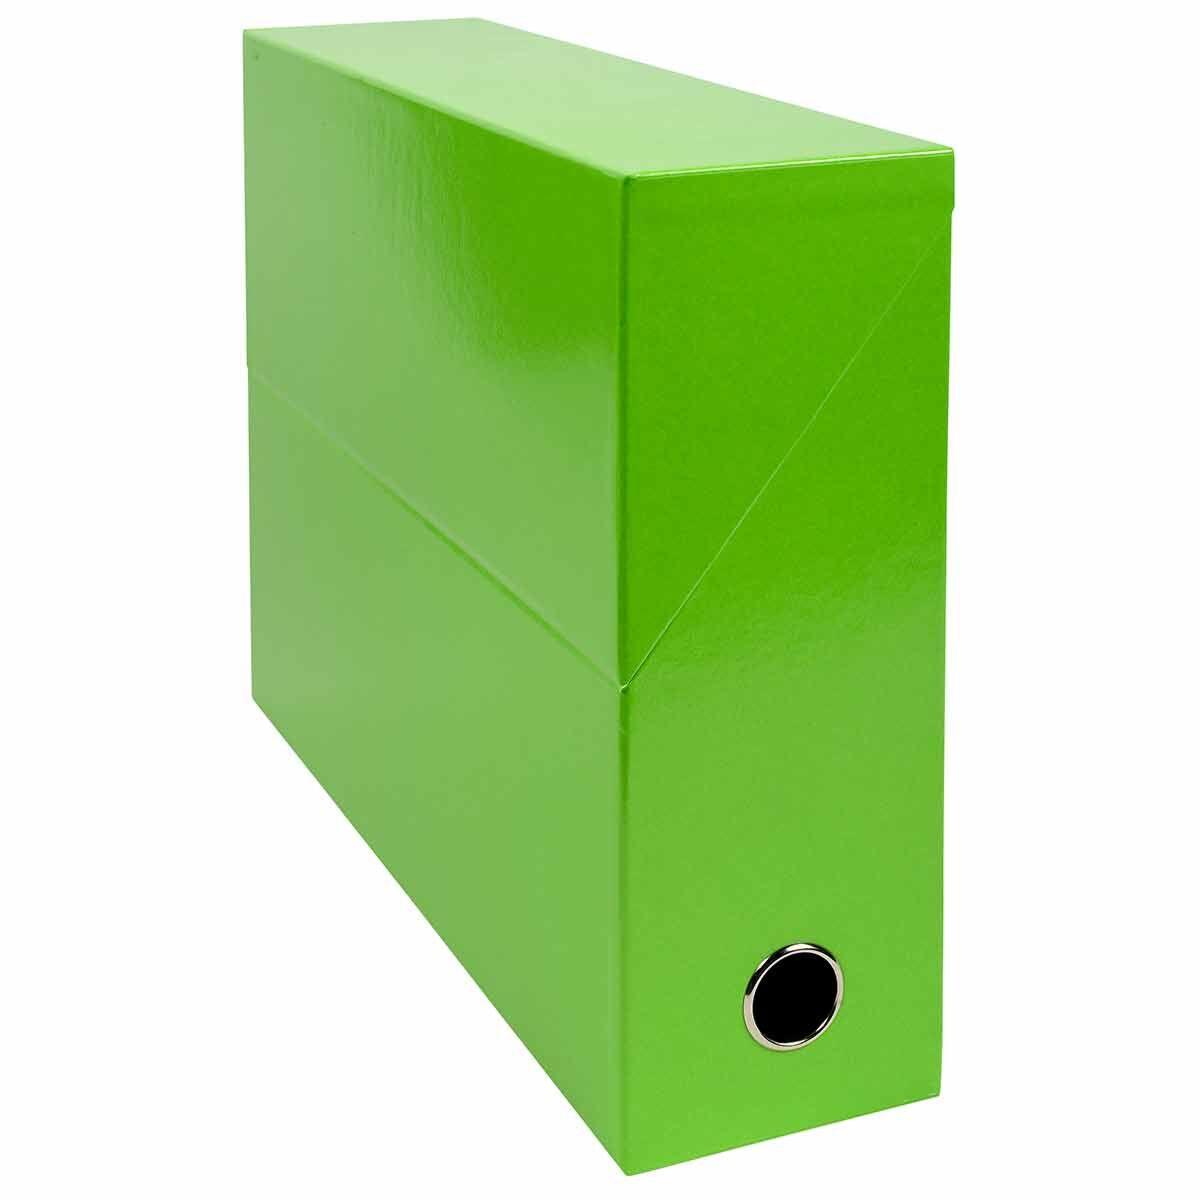 Exacompta Iderama Filing Box 90mm Pack of 5 Lime Green